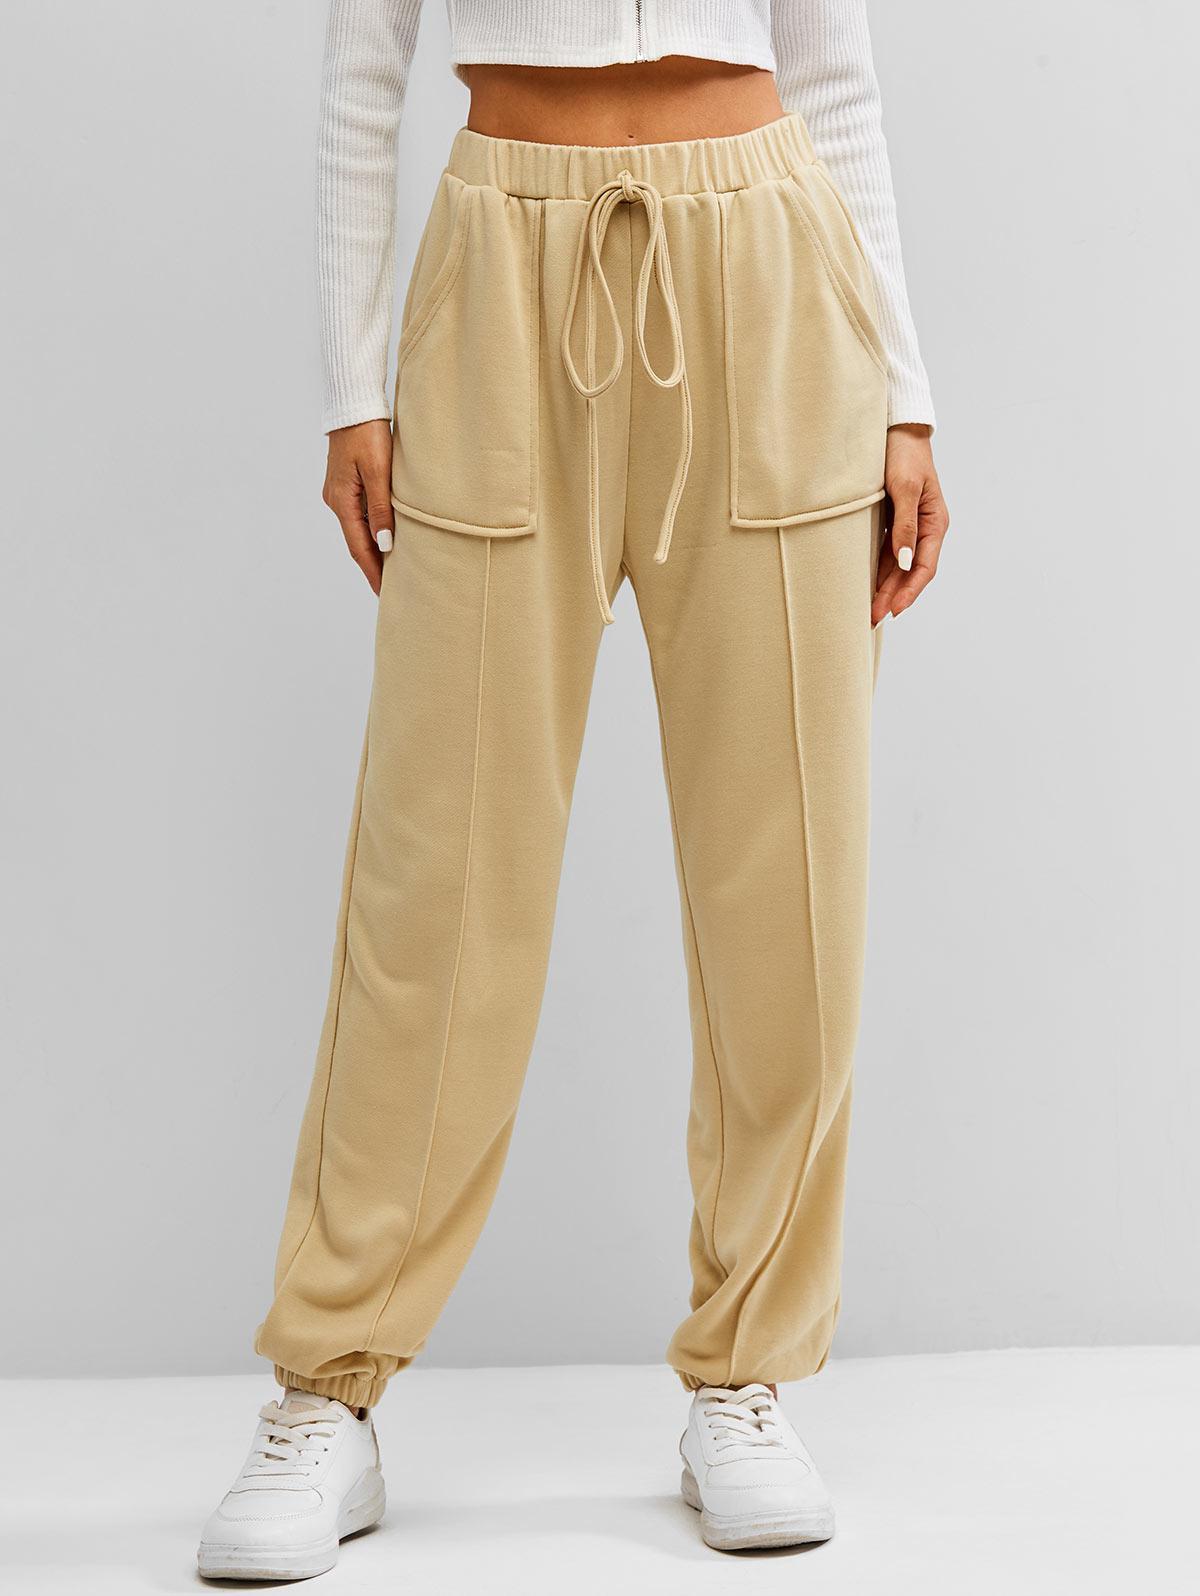 Pantalon de Jogging à Taille Haute - ZAFUL - Modalova